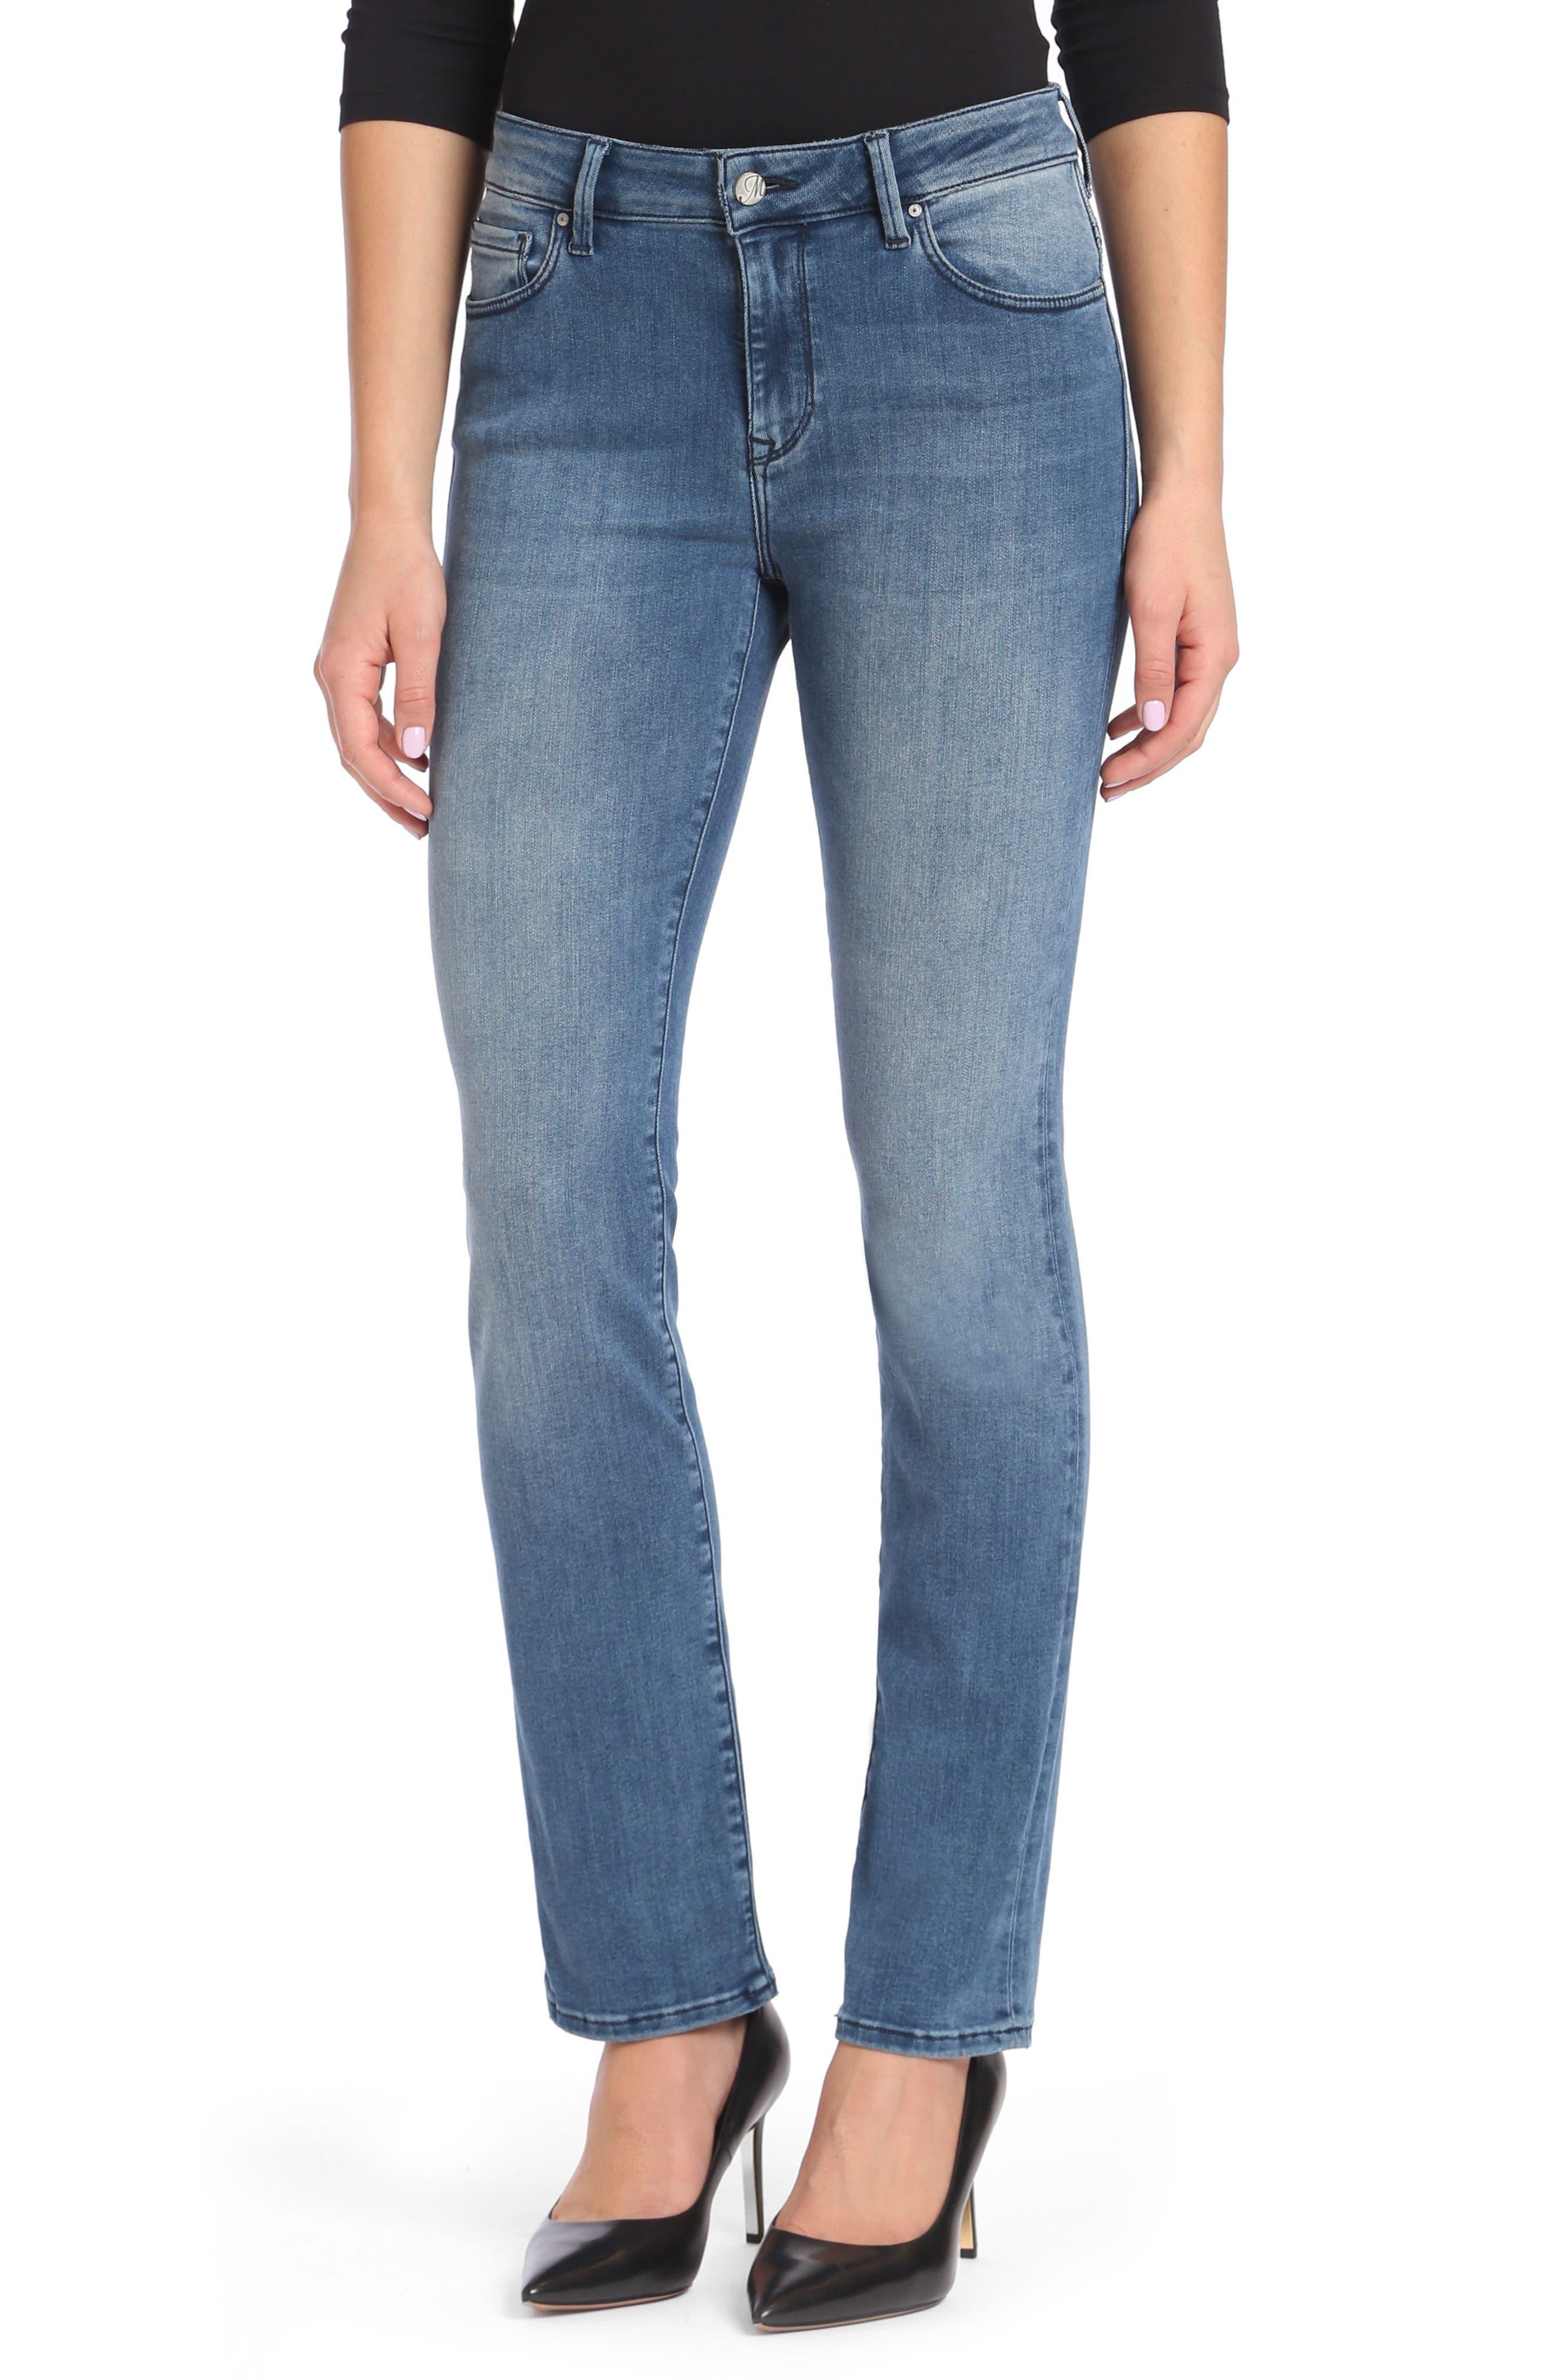 Kendra High Waist Straight Leg Jeans,                         Main,                         color, Light Foggy Blue Tribeca